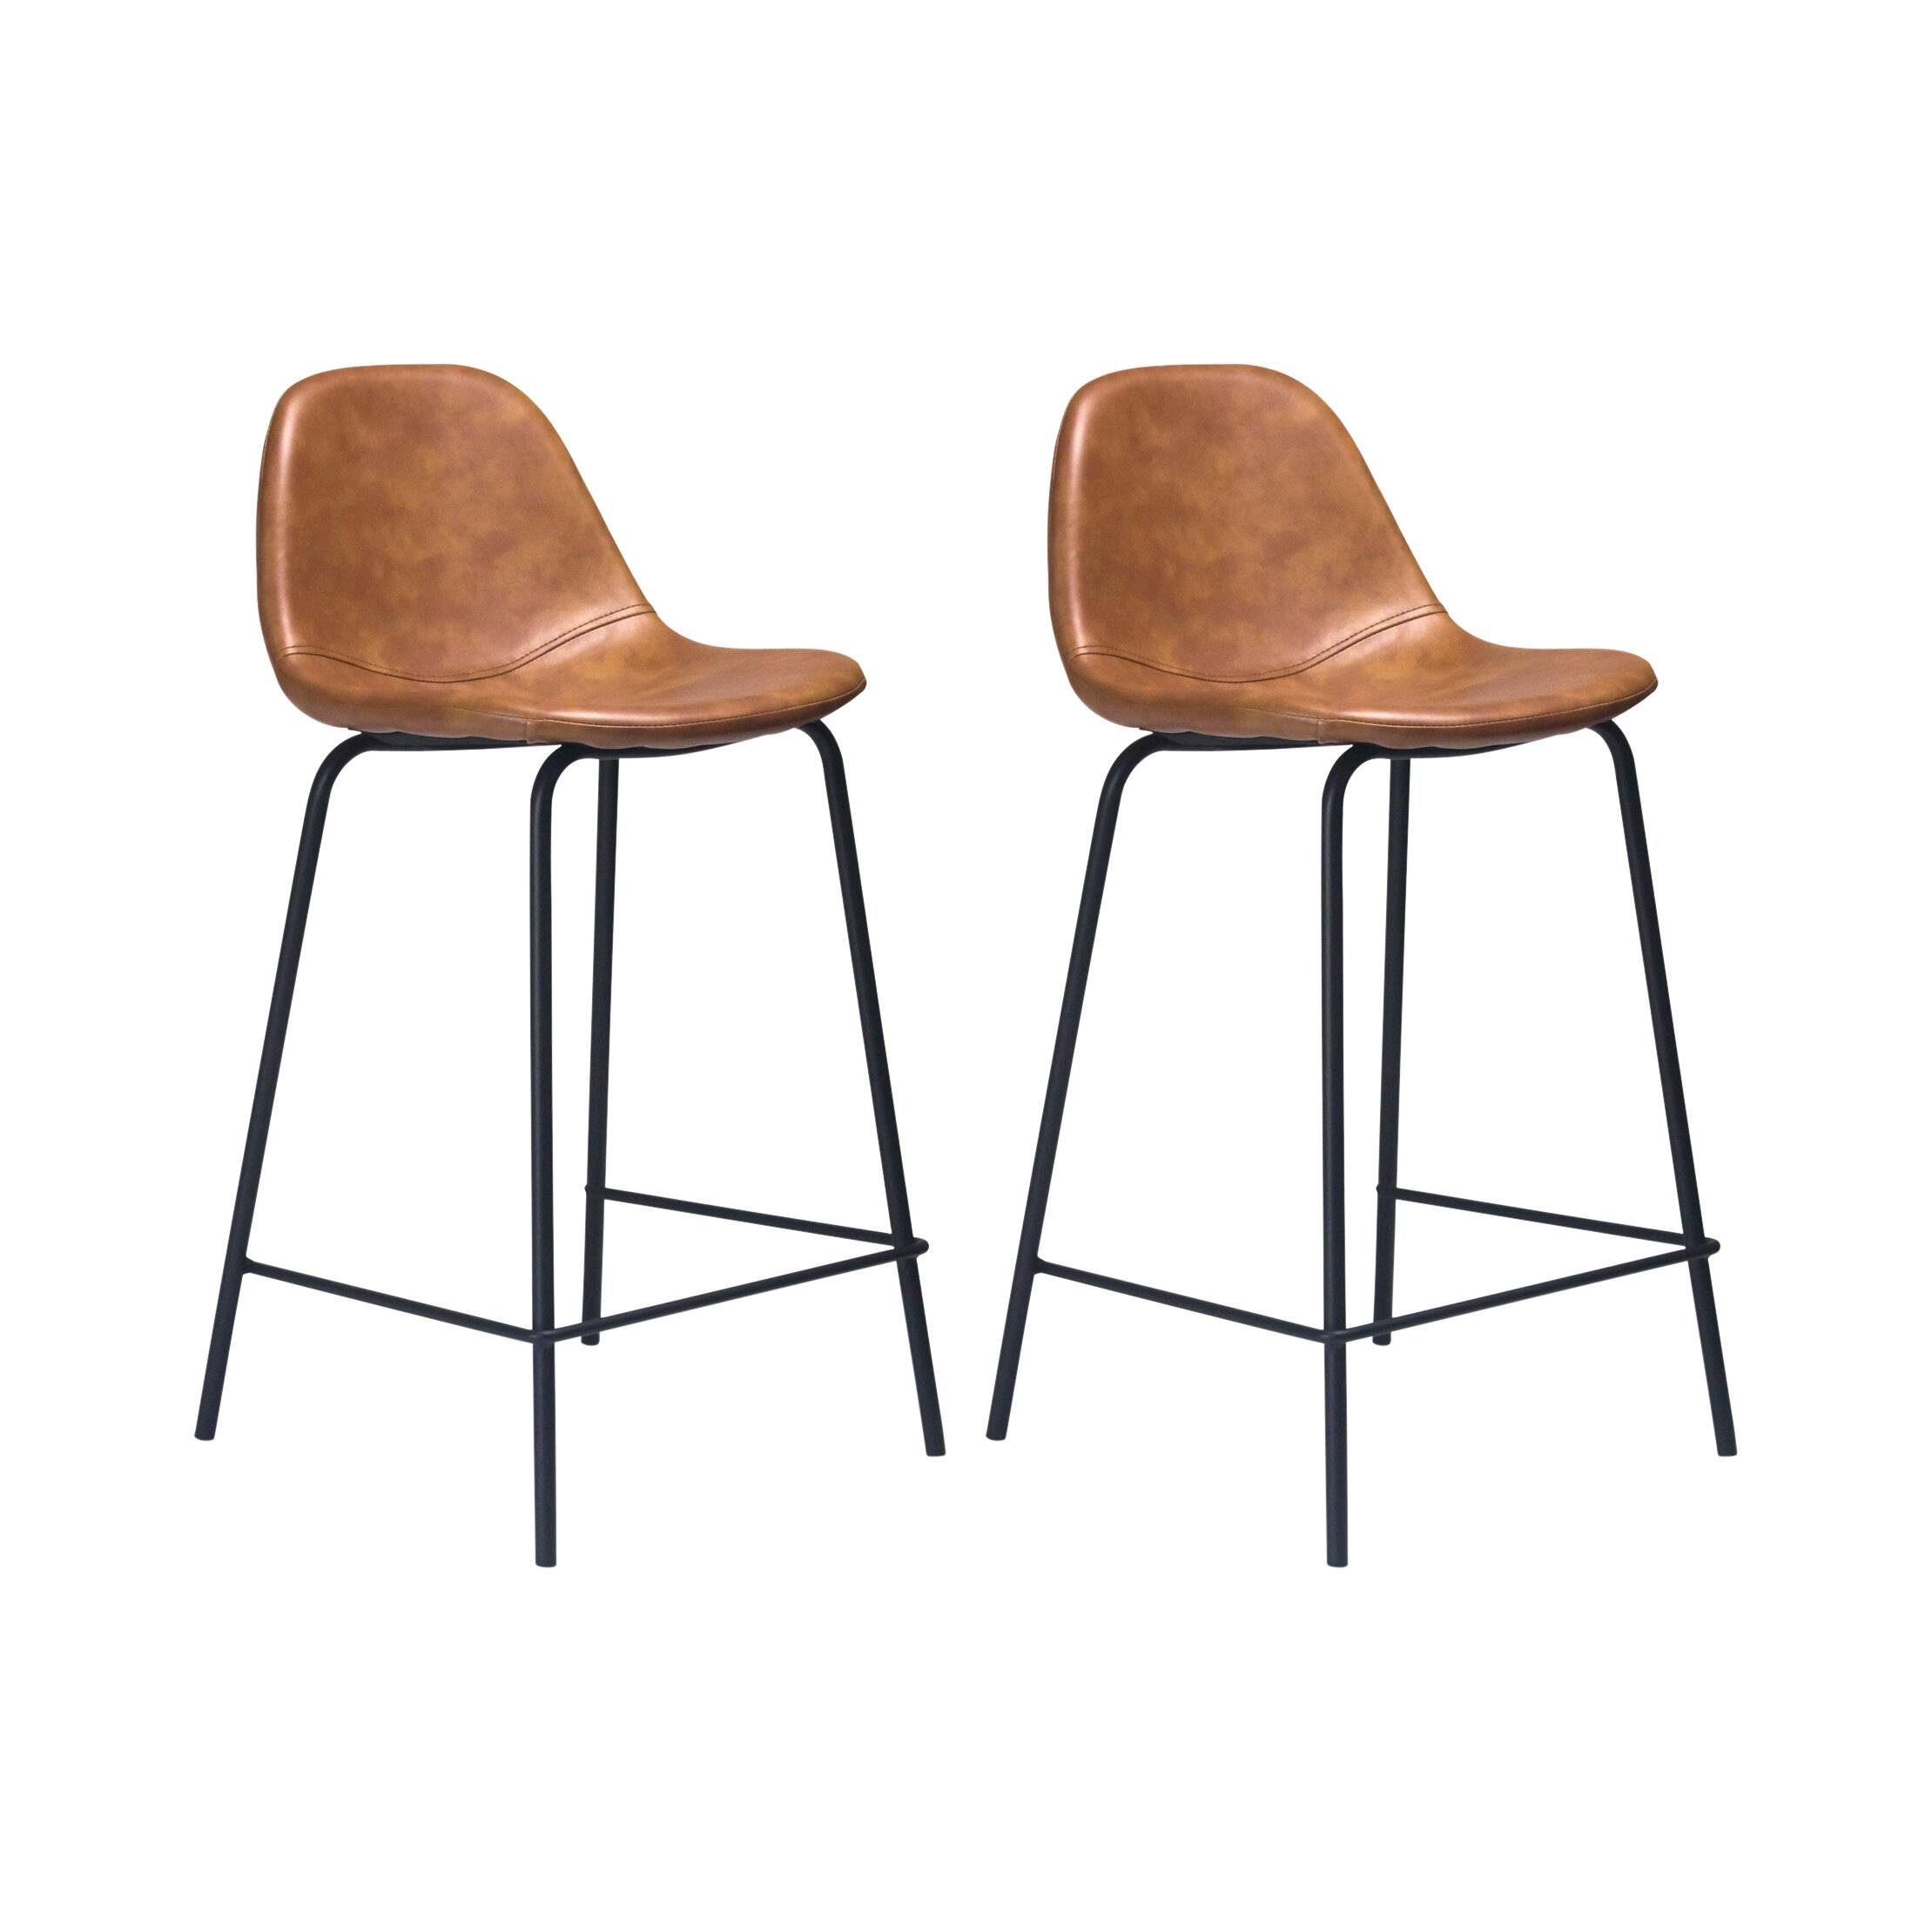 Image of: Aeon Furniture Neil Bar Counter Stool Reviews Wayfair